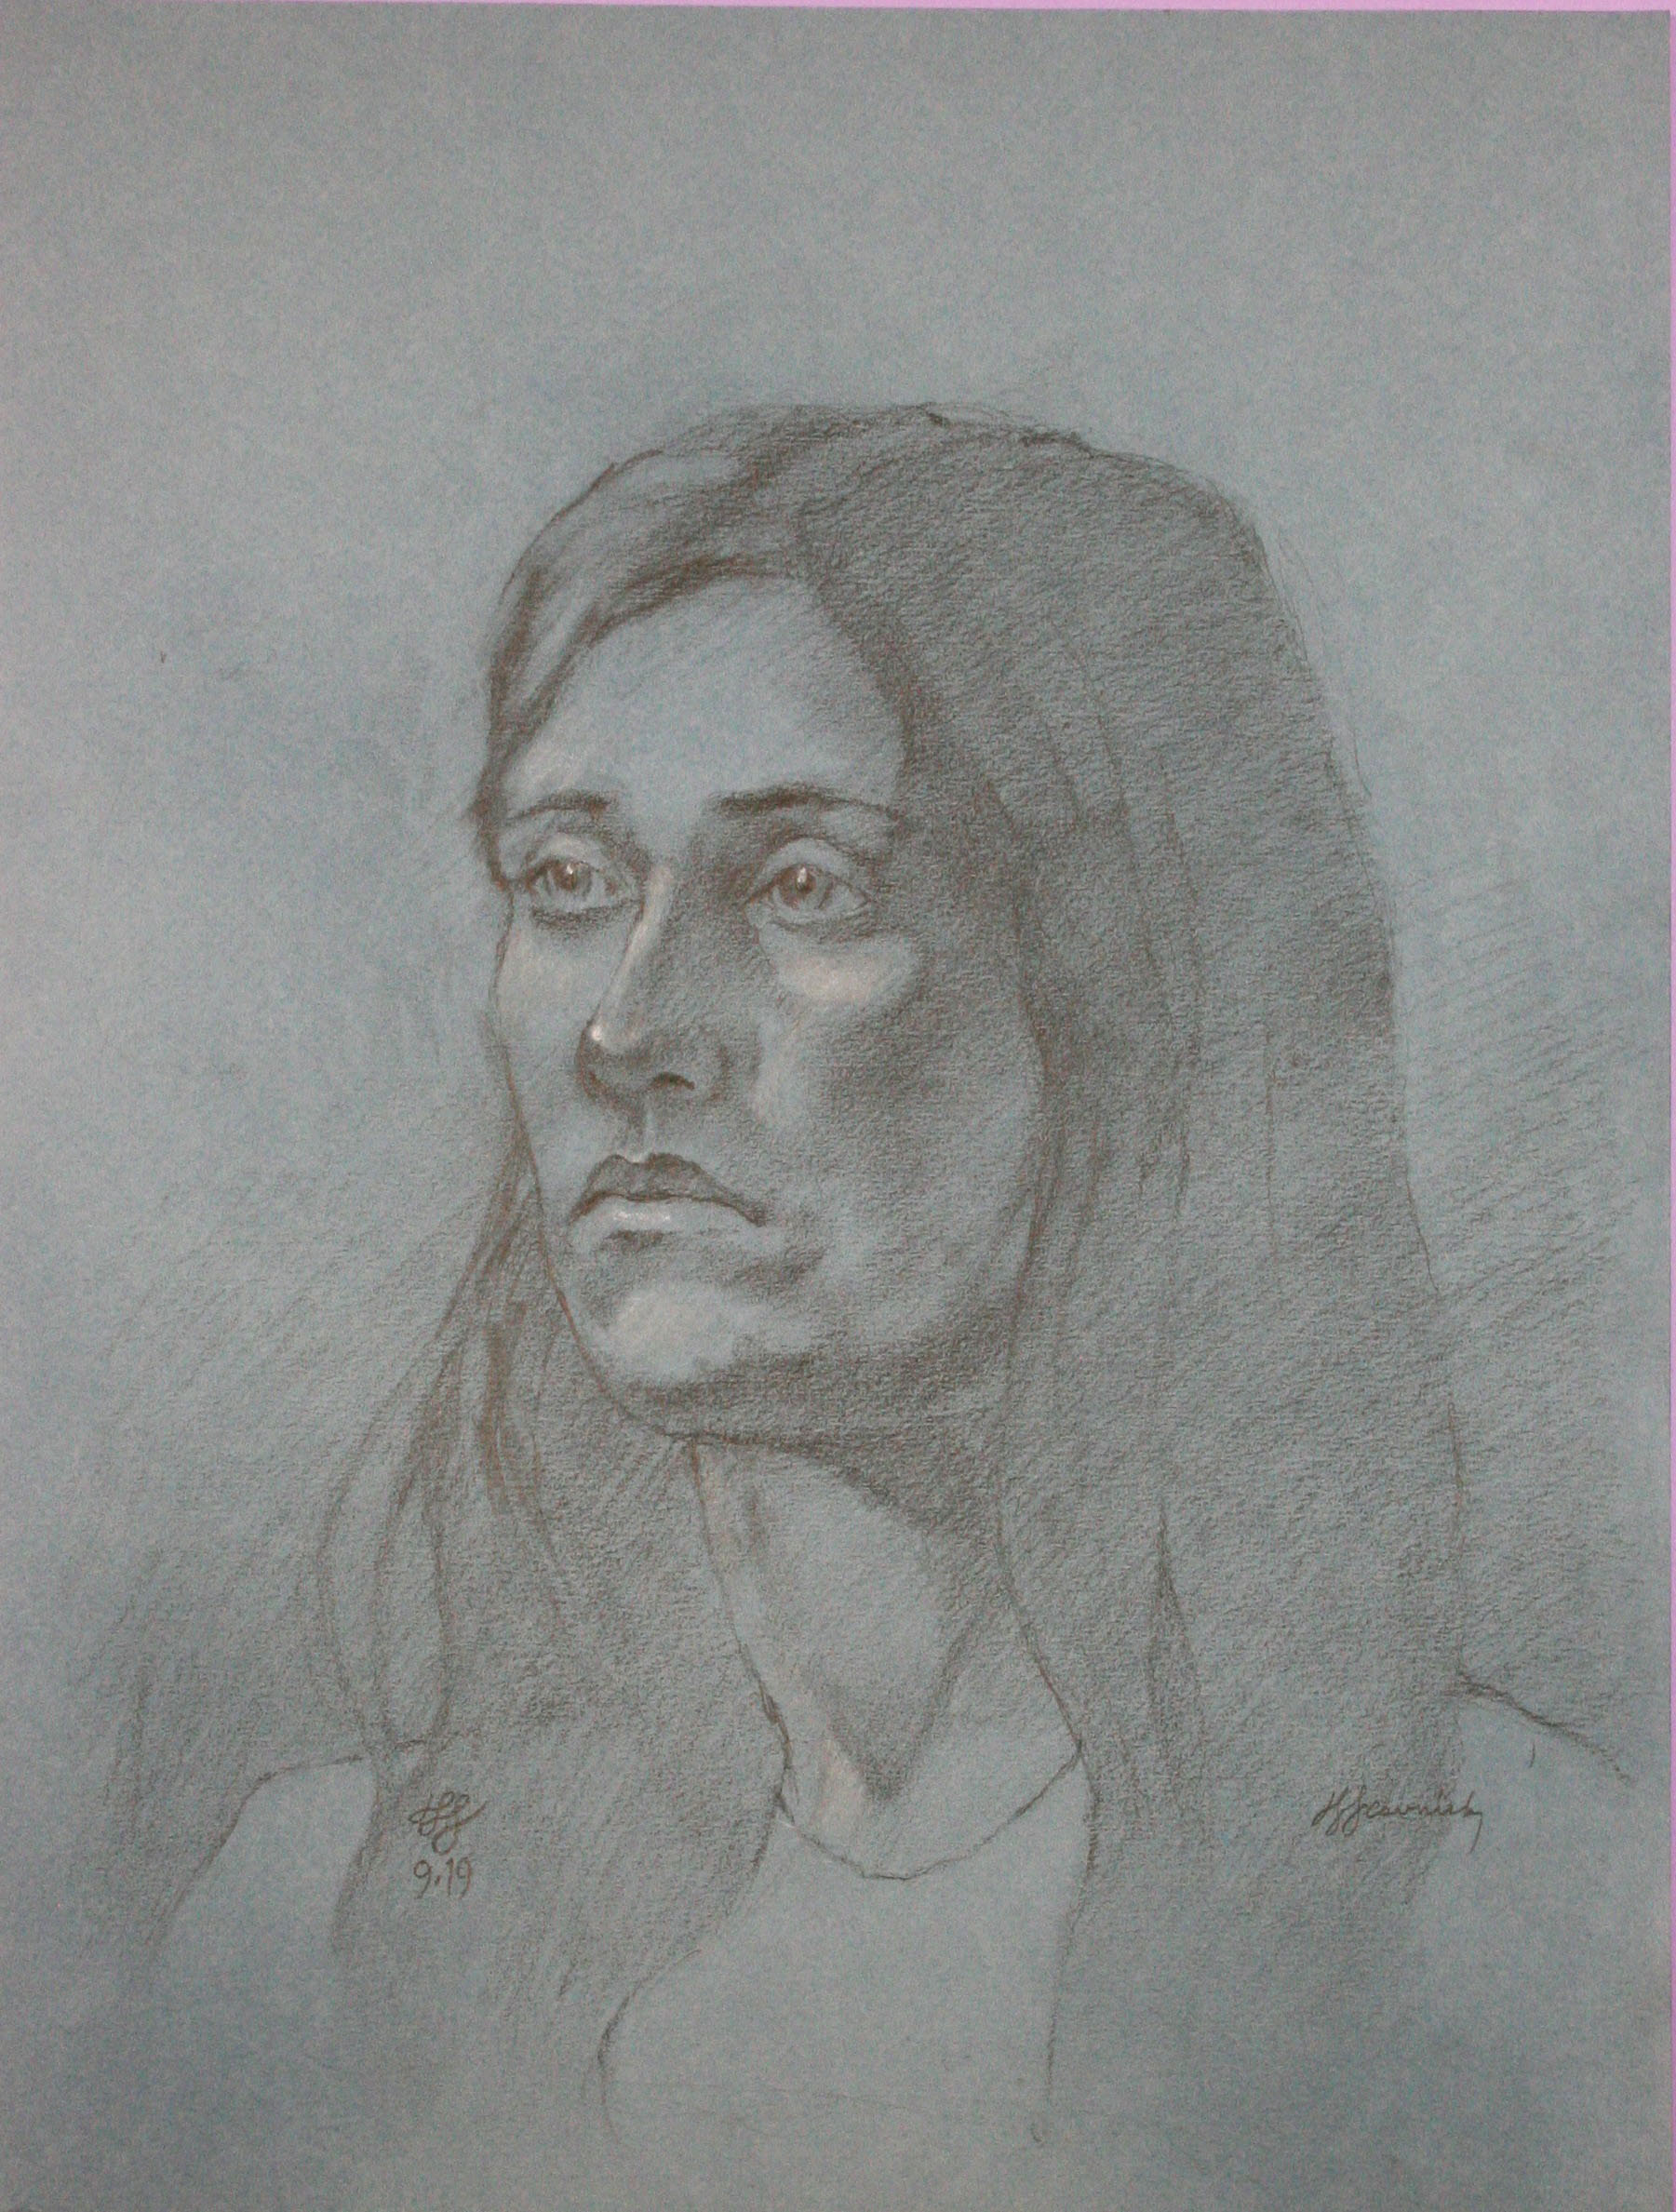 John Scavnicky - Graphite